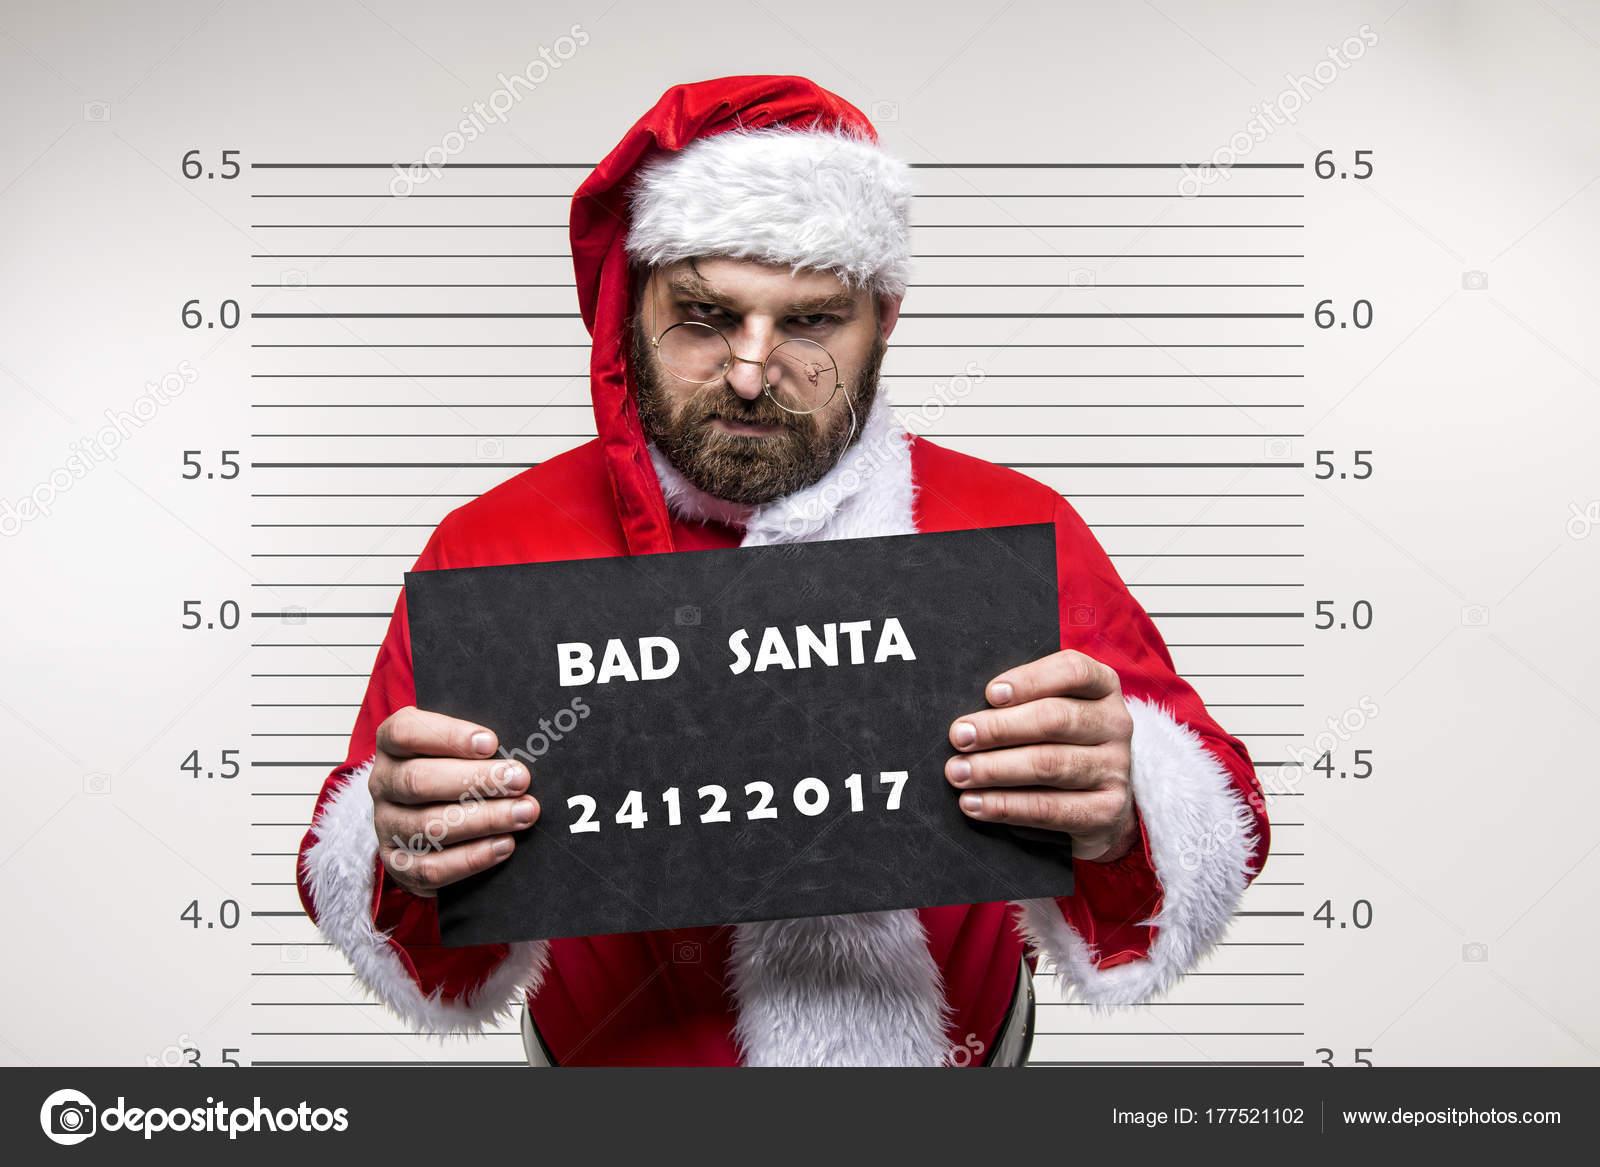 Photos Bad Santa Movie Bad Santa Claus Pointing You Concept Christmas Stock Photo C Aarrttuurr 177521102